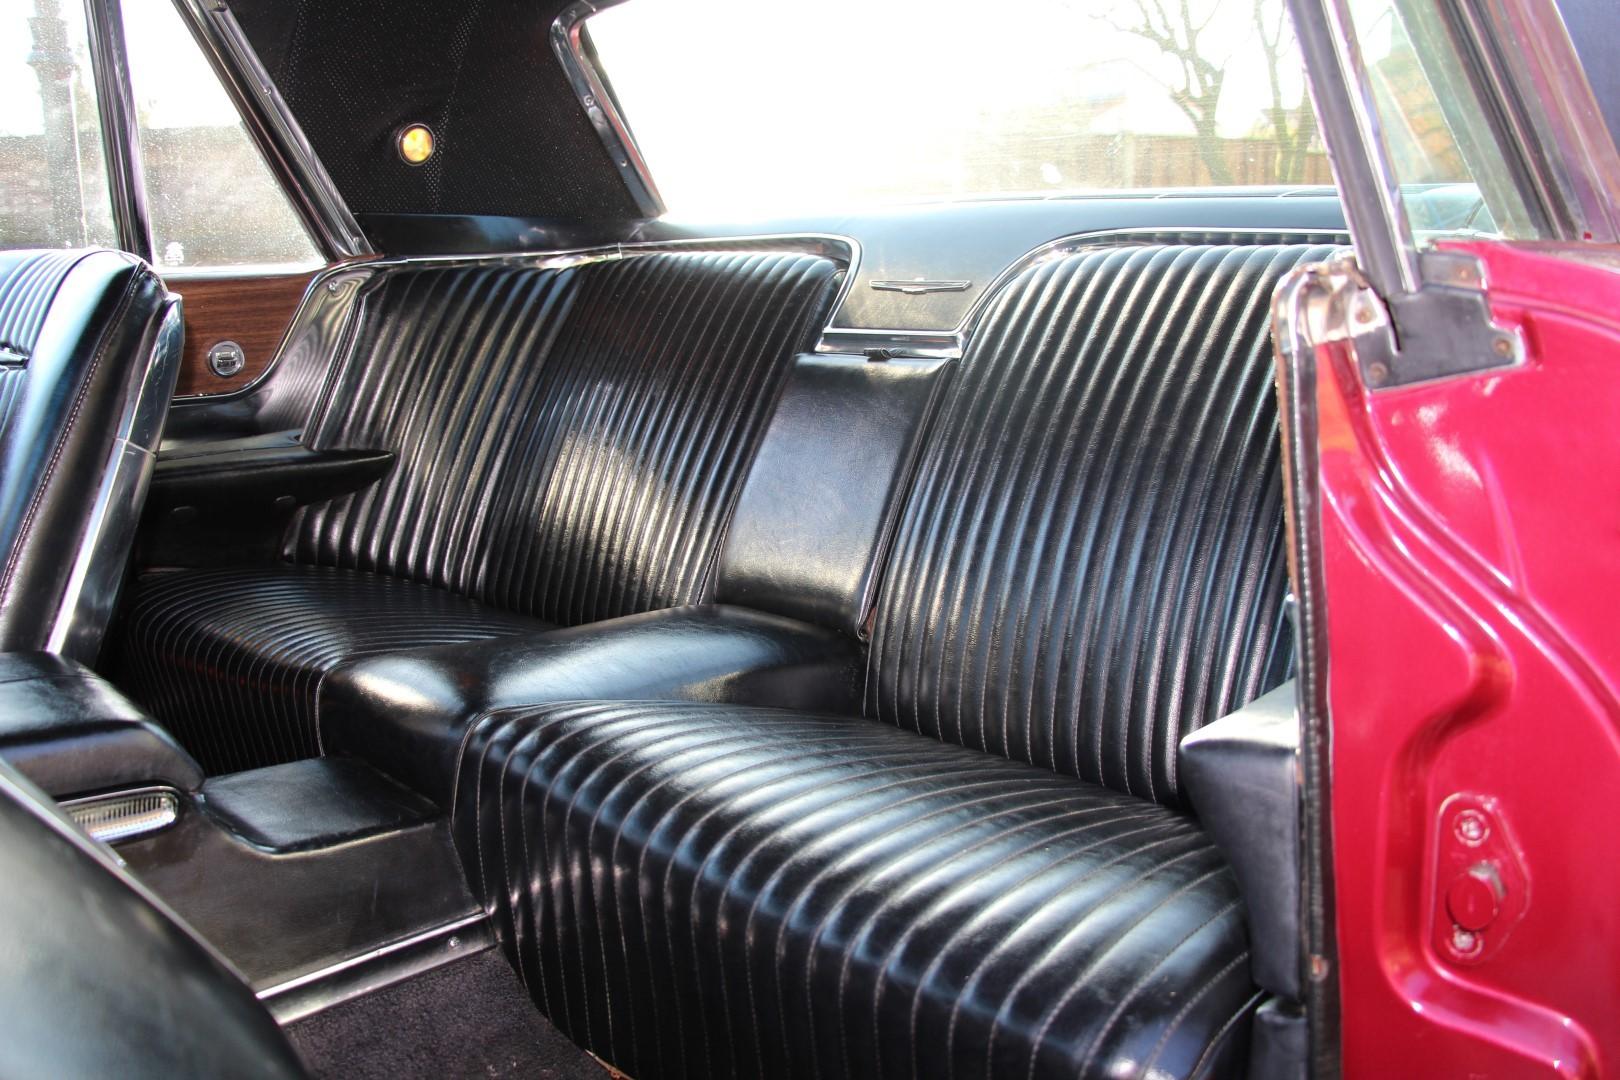 1965 Ford Thunderbird Hardtop - Burgundy (4)